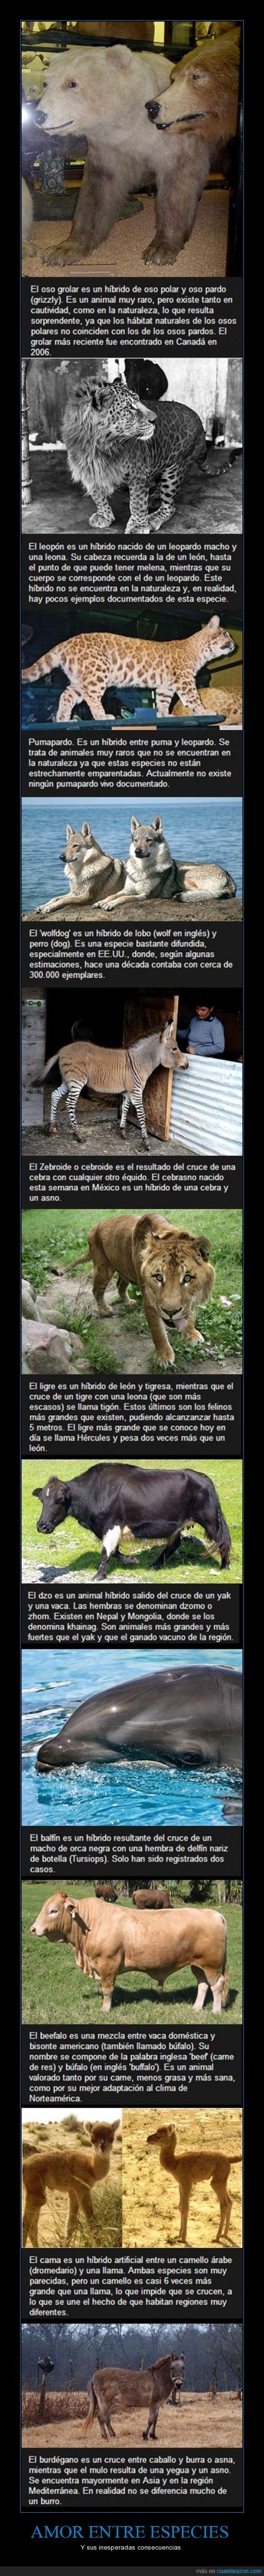 animales,burro,dzo,híbrido,león,mezcla,mutantes,oso,pumapardo,tigre